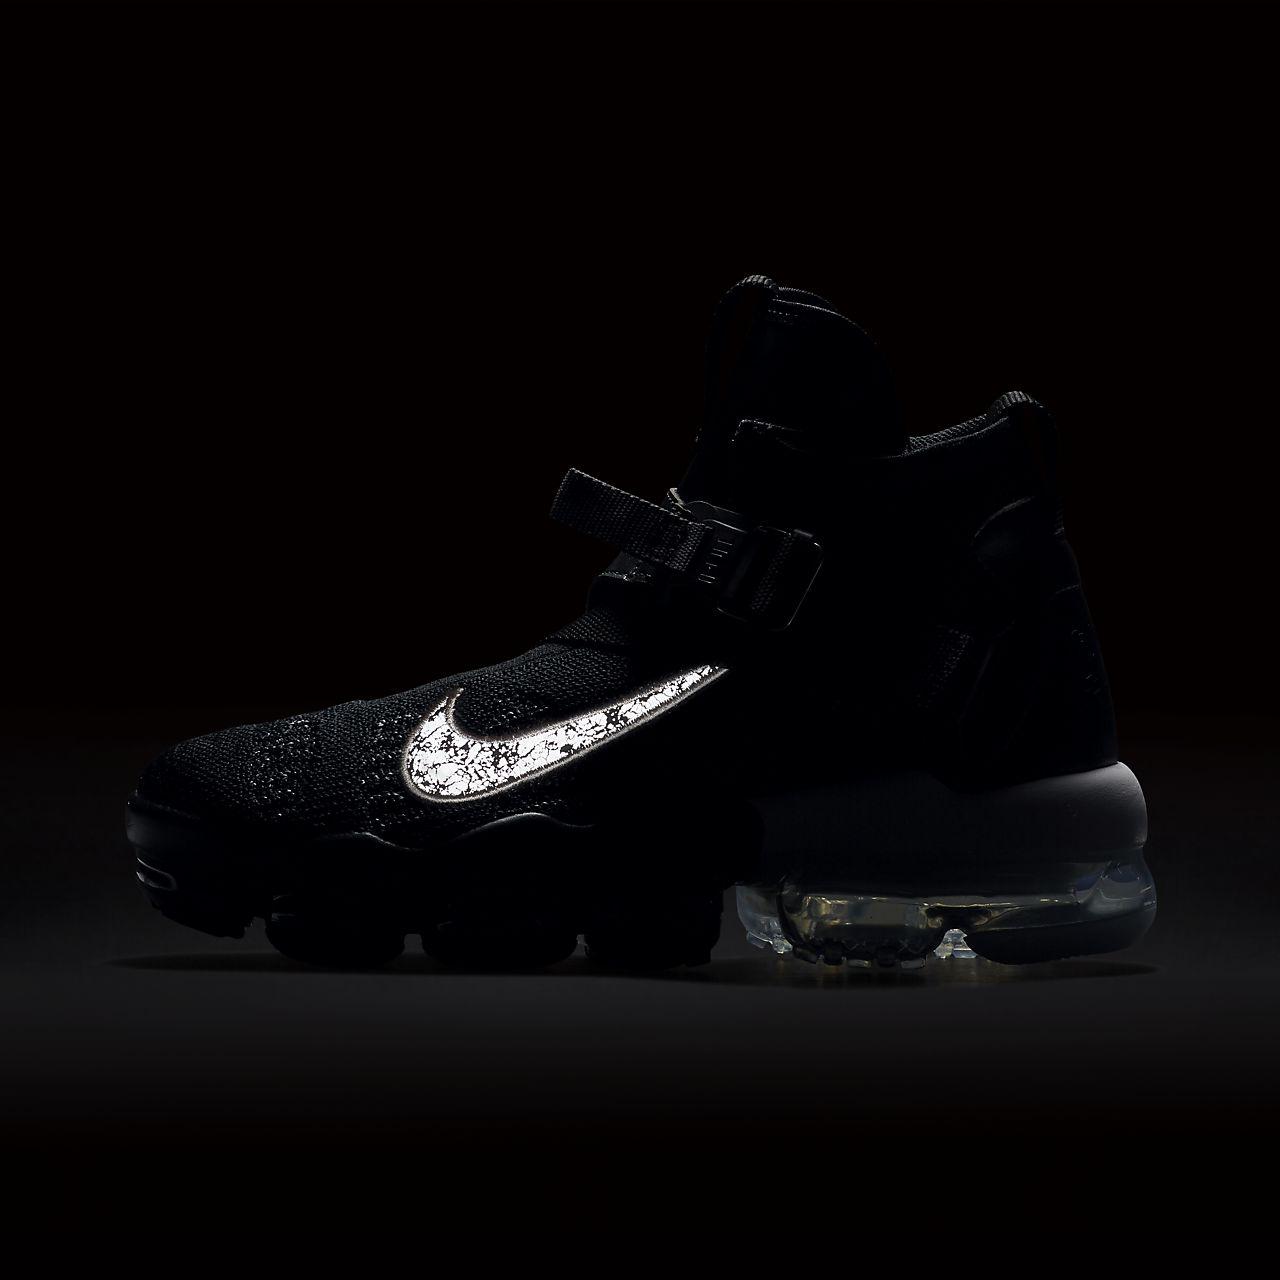 6ff639add2435 Nike Air VaporMax Premier Flyknit Men s Shoe. Nike.com AU